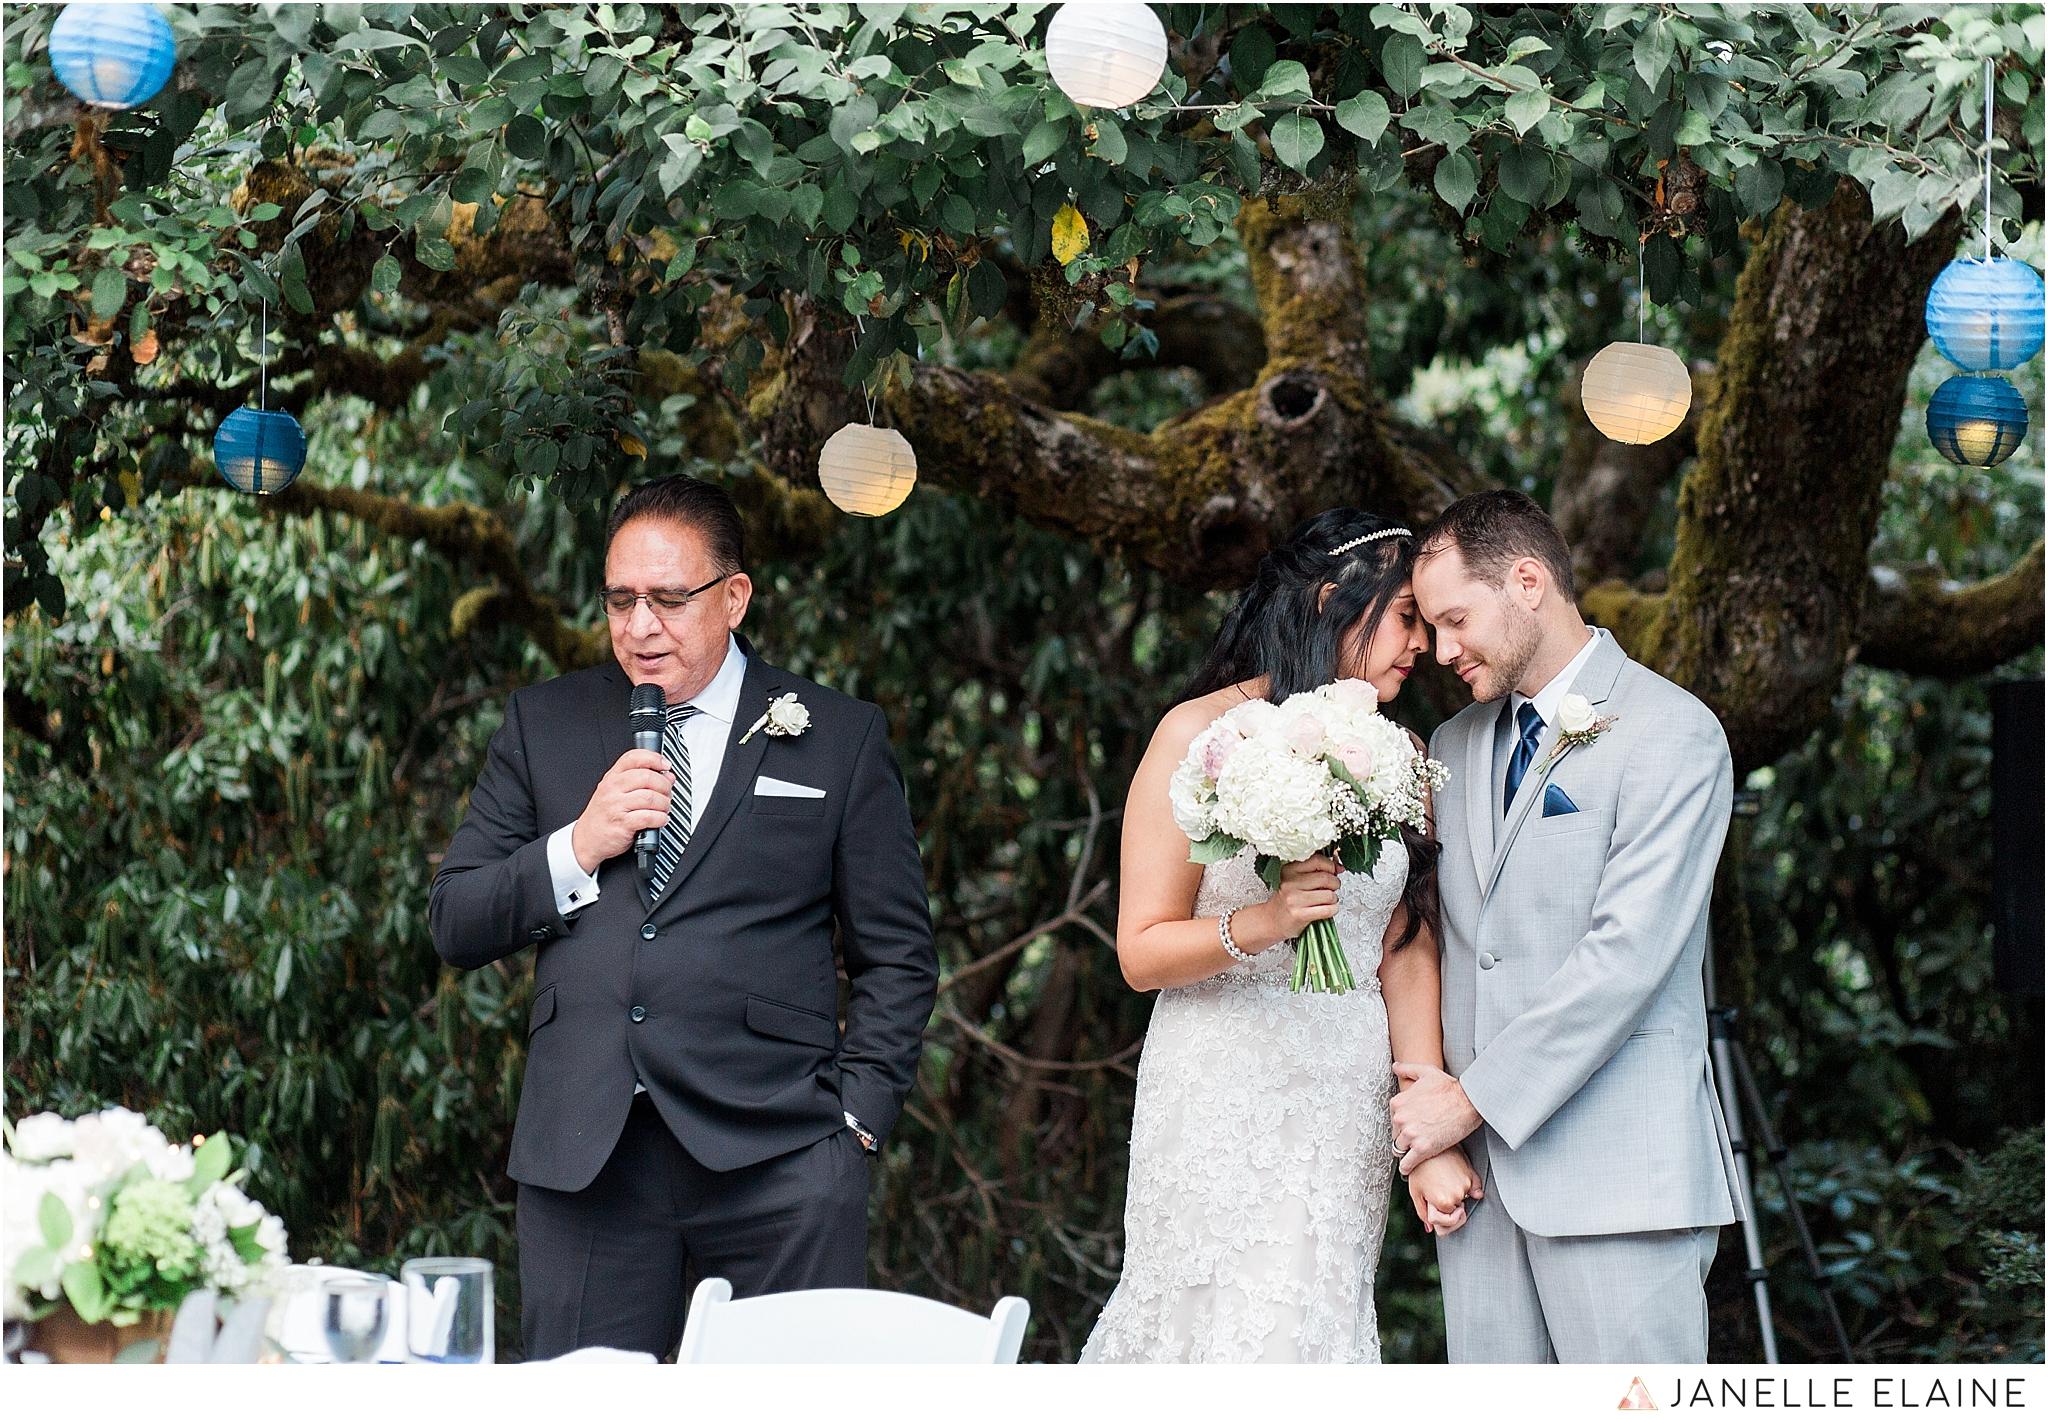 janelle elaine photography-professional wedding photographer-seattle-bellevue-robinswood house-258.jpg